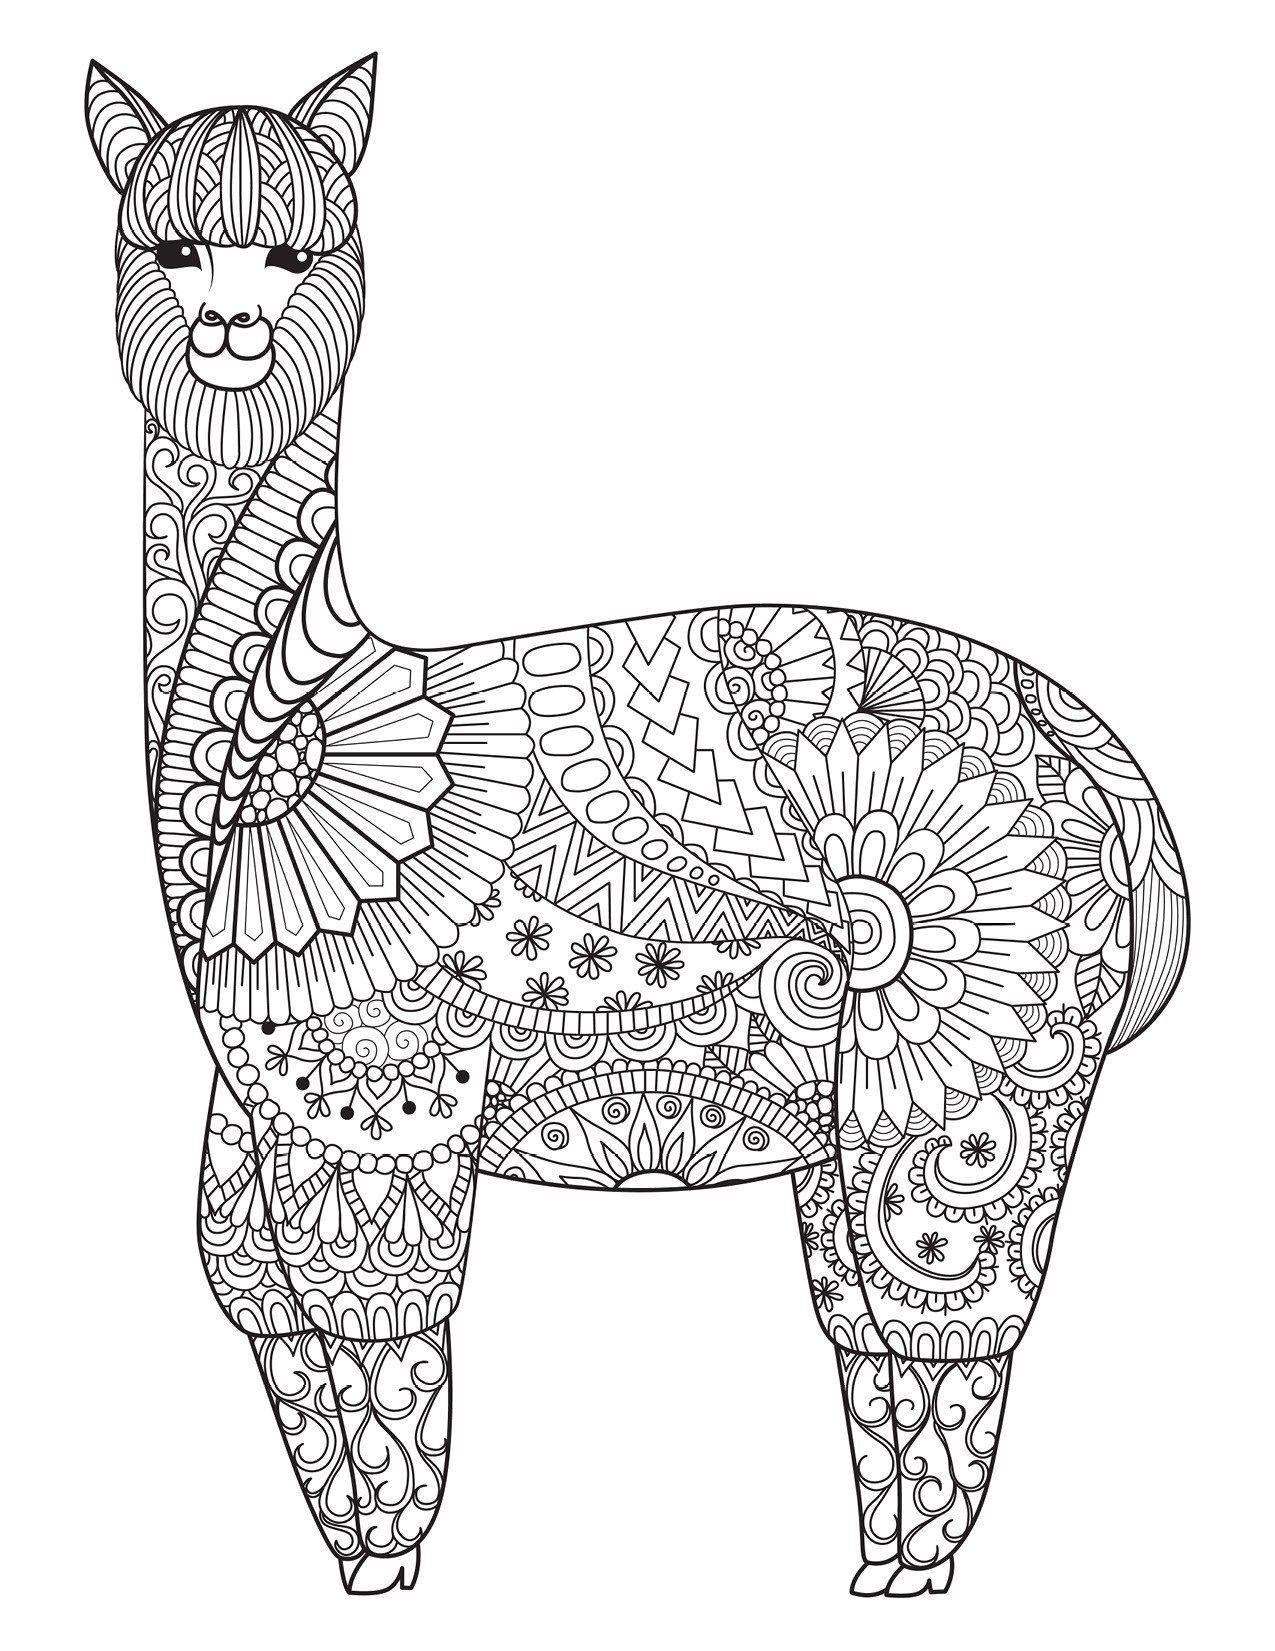 mandala ausmalbilder lama  kinder ausmalbilder